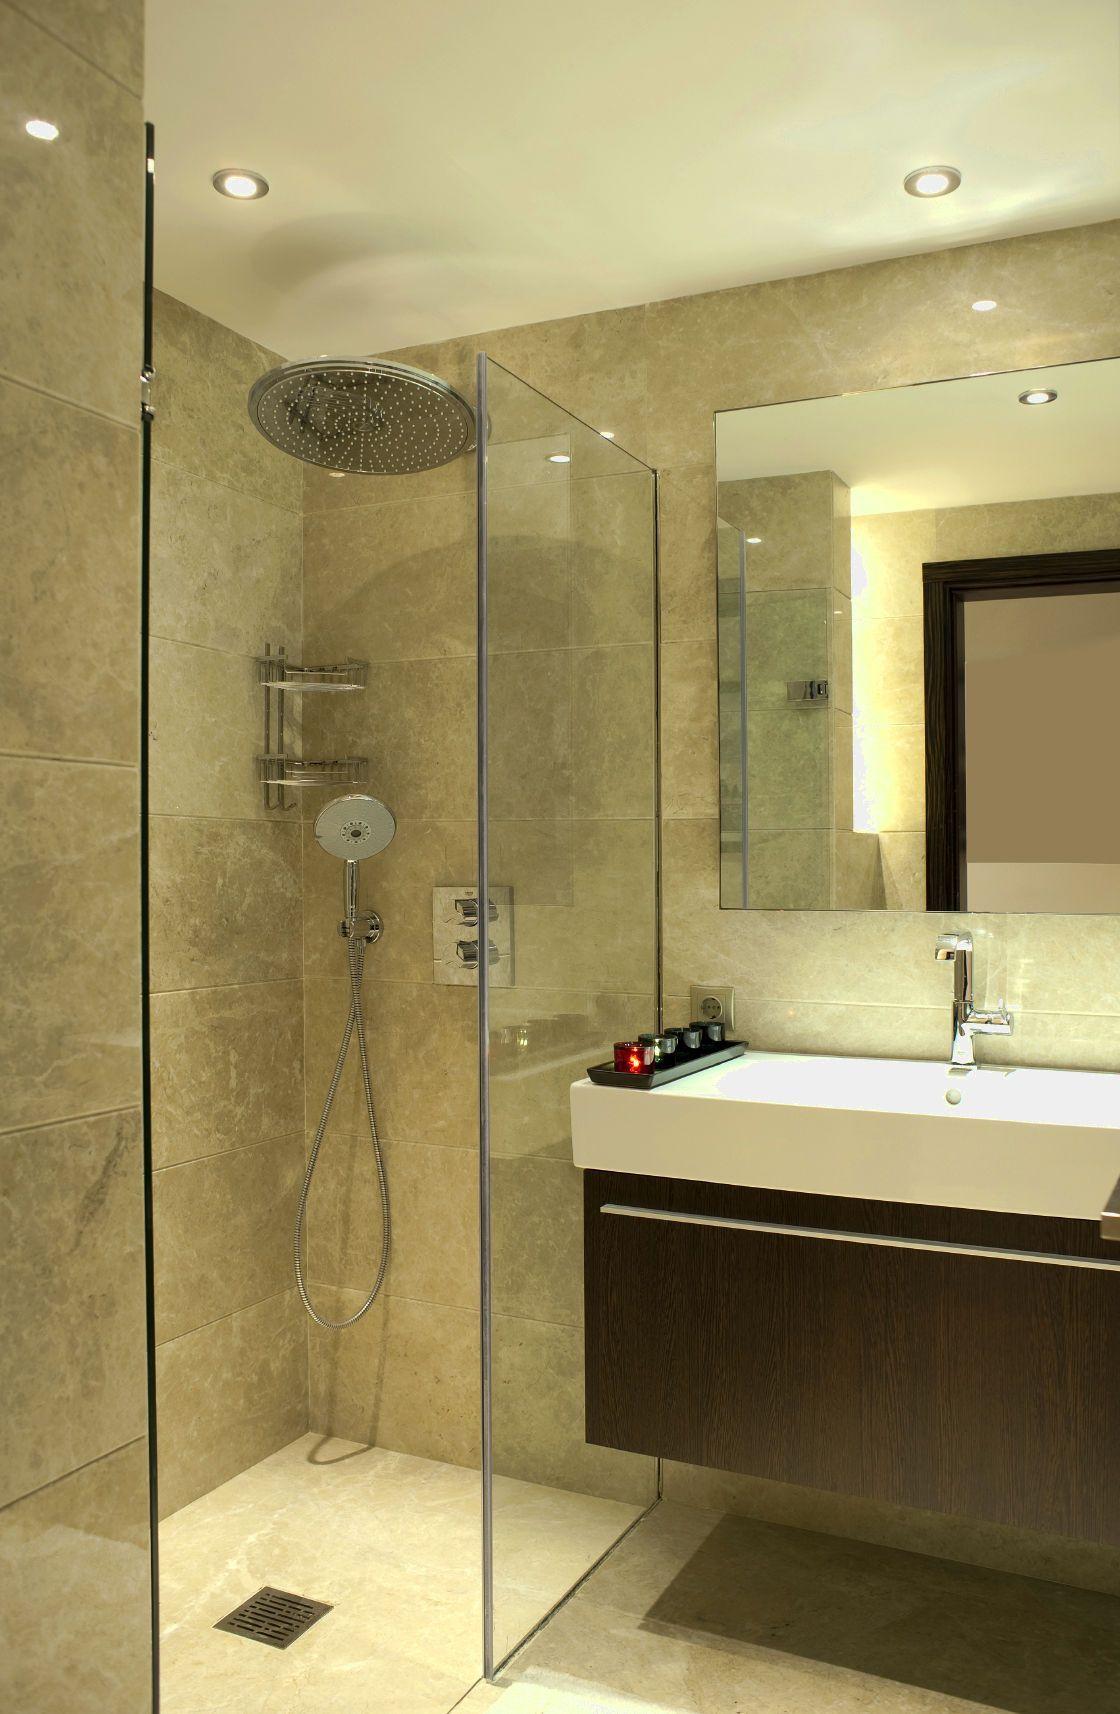 Modern Bathrooms Create A Simplistic And Clean Feeling In Order To Design Your Modern Bath Small Bathroom Renovations Bathroom Layout Ensuite Bathroom Designs